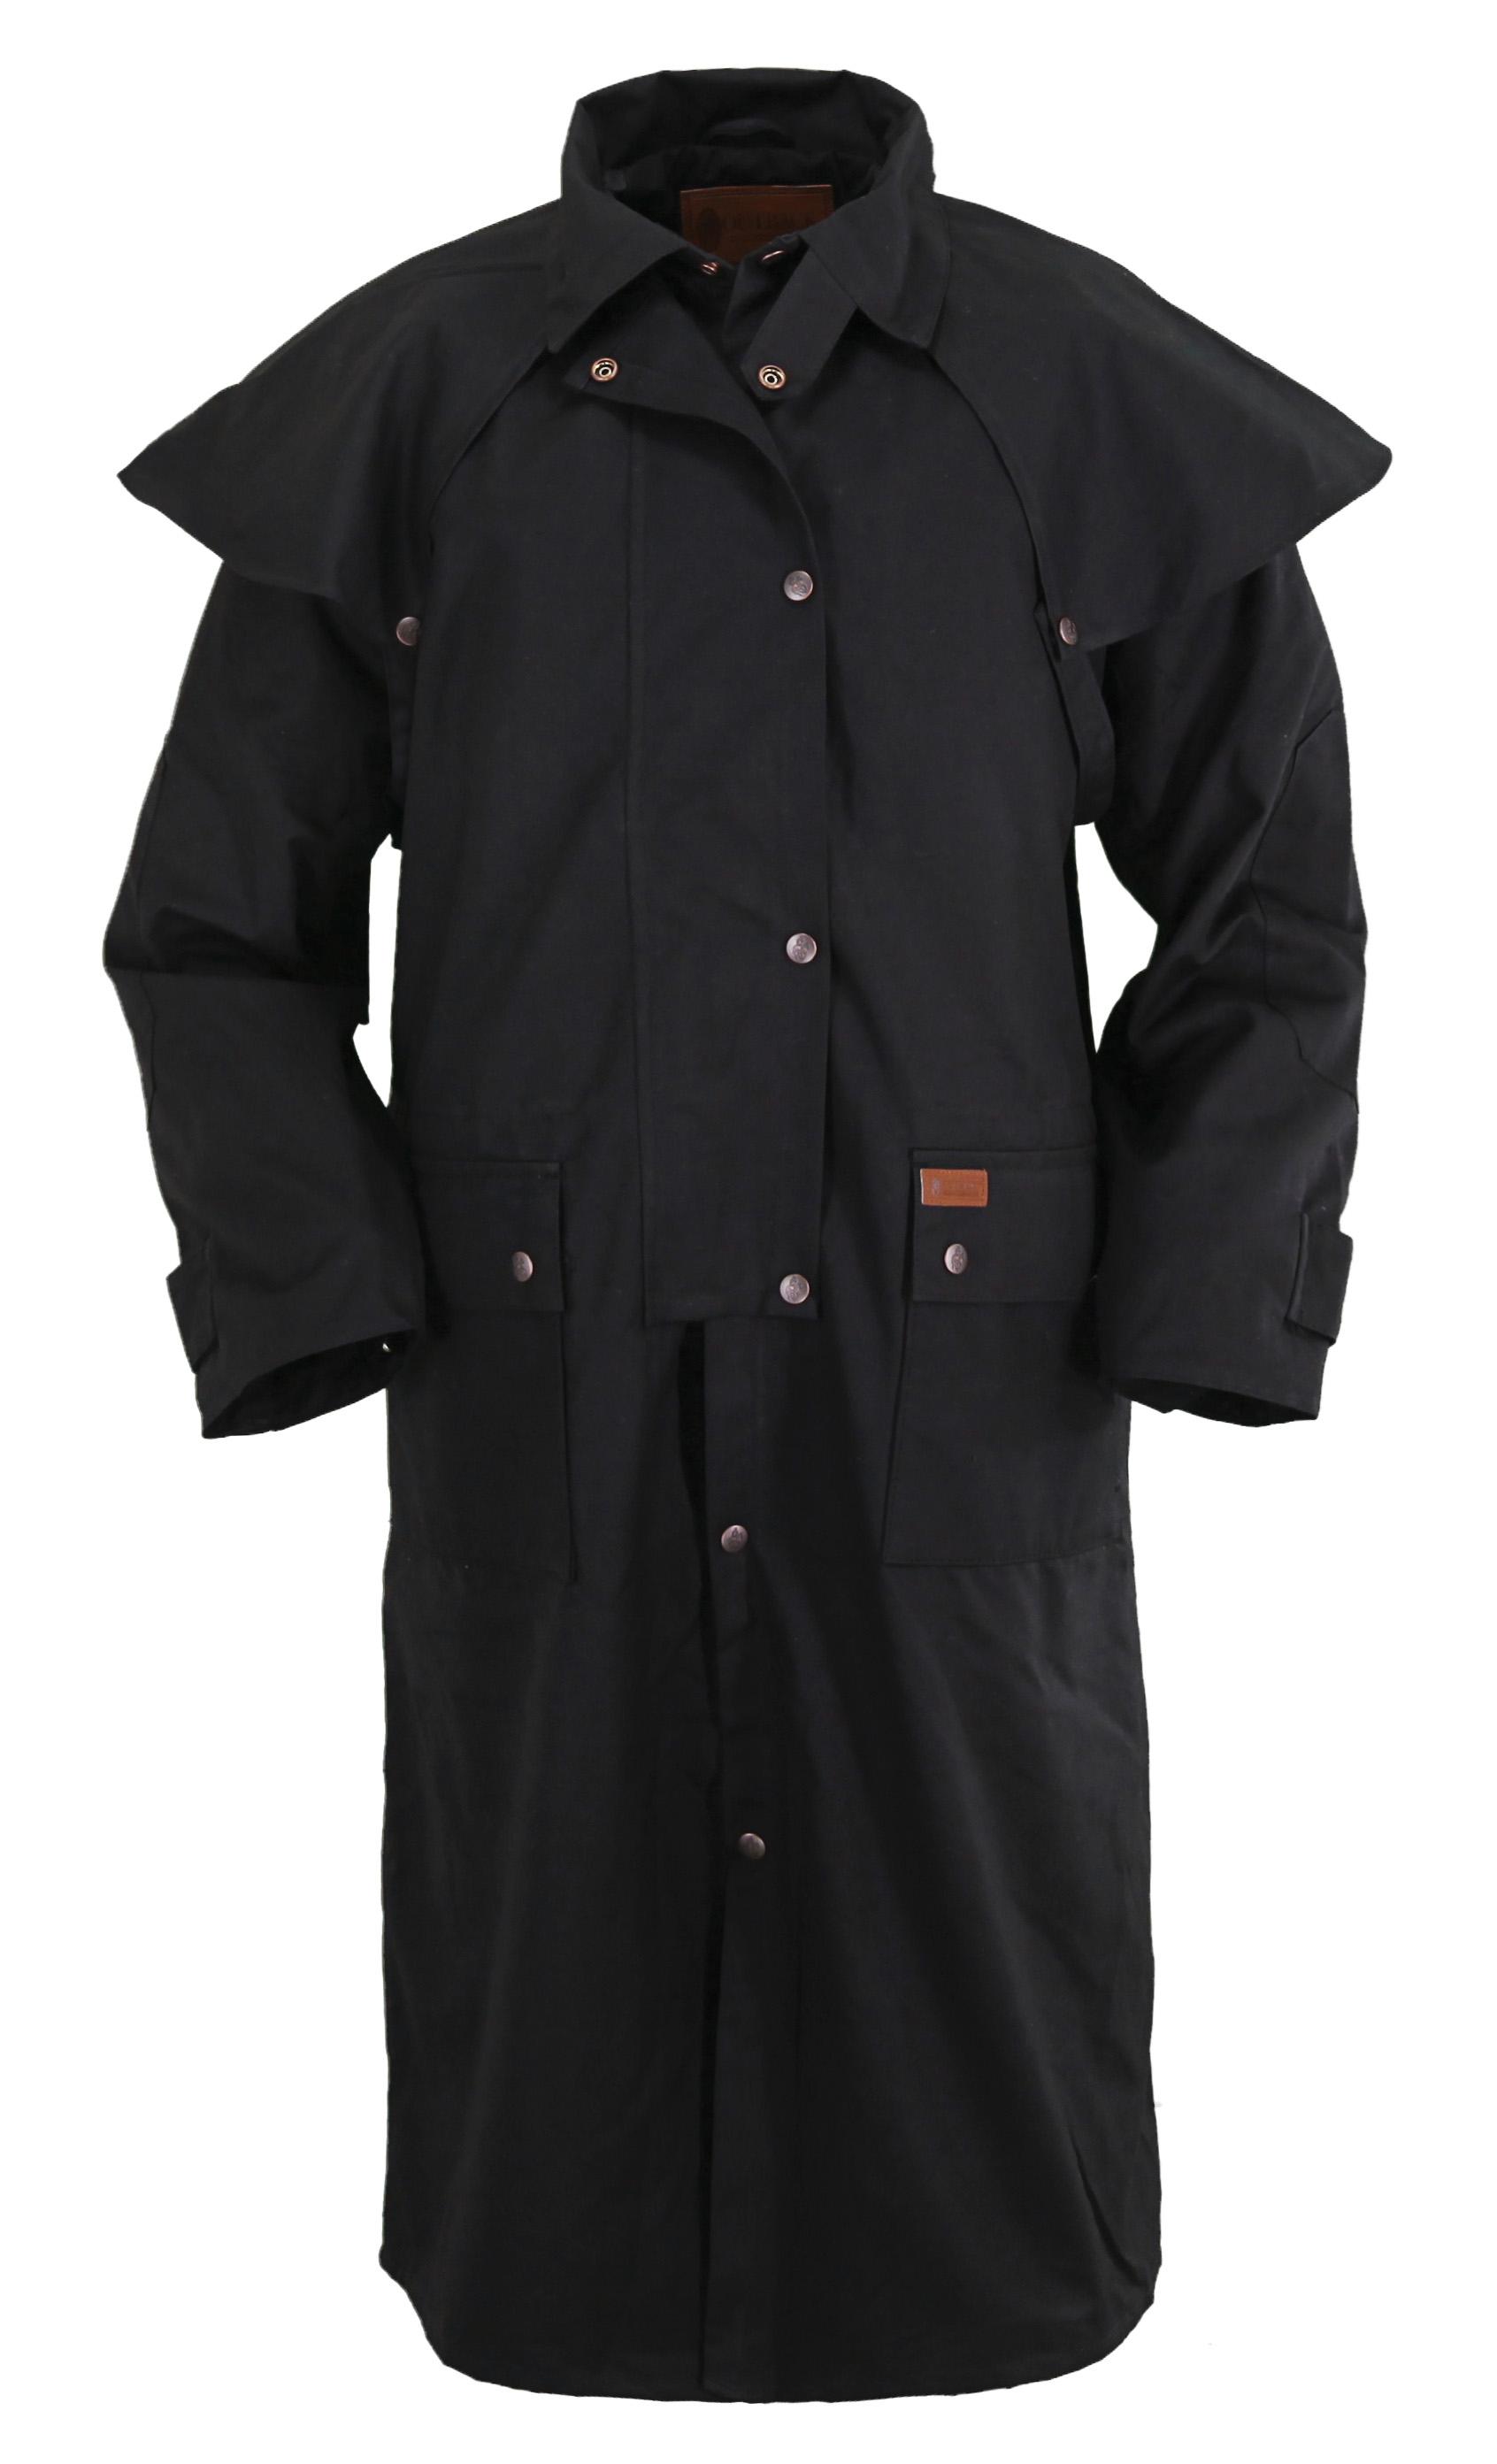 Duster Coat Deals On 1001 Blocks